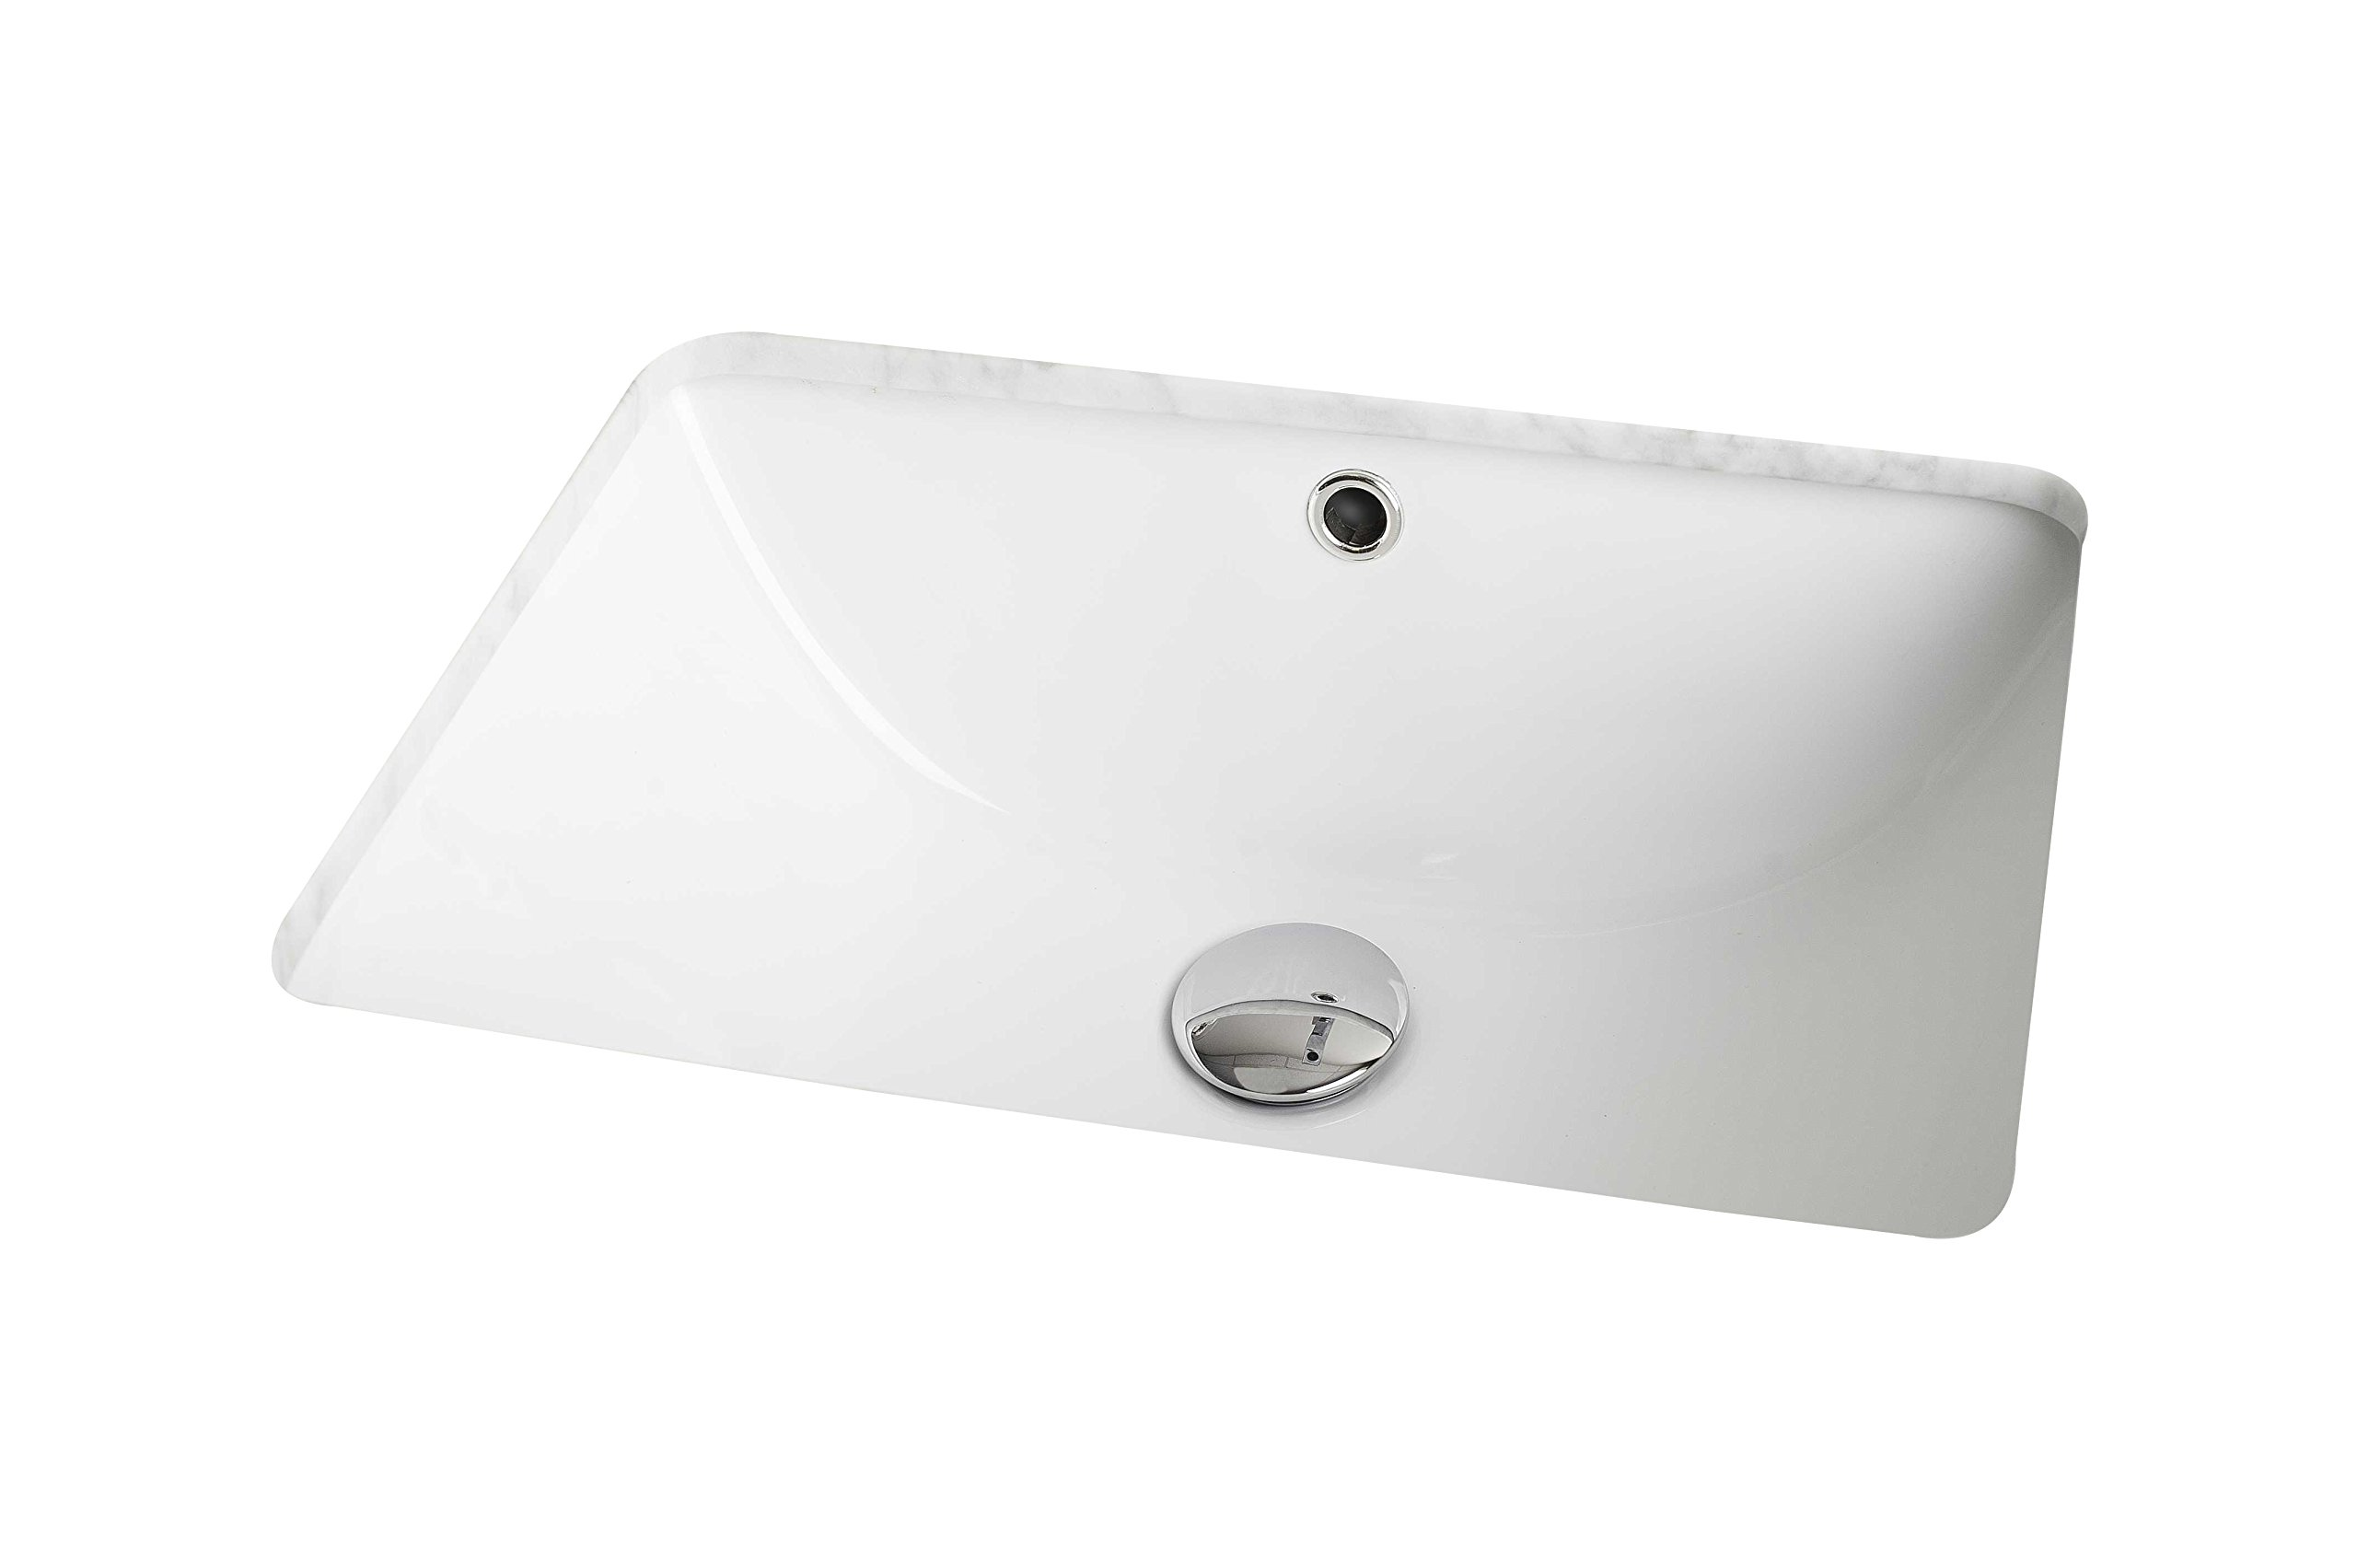 Jade Bath JB-536 18.25'' W x 13.75'' D CUPC Certified Rectangle Undermount Sink, White by Jade Bath